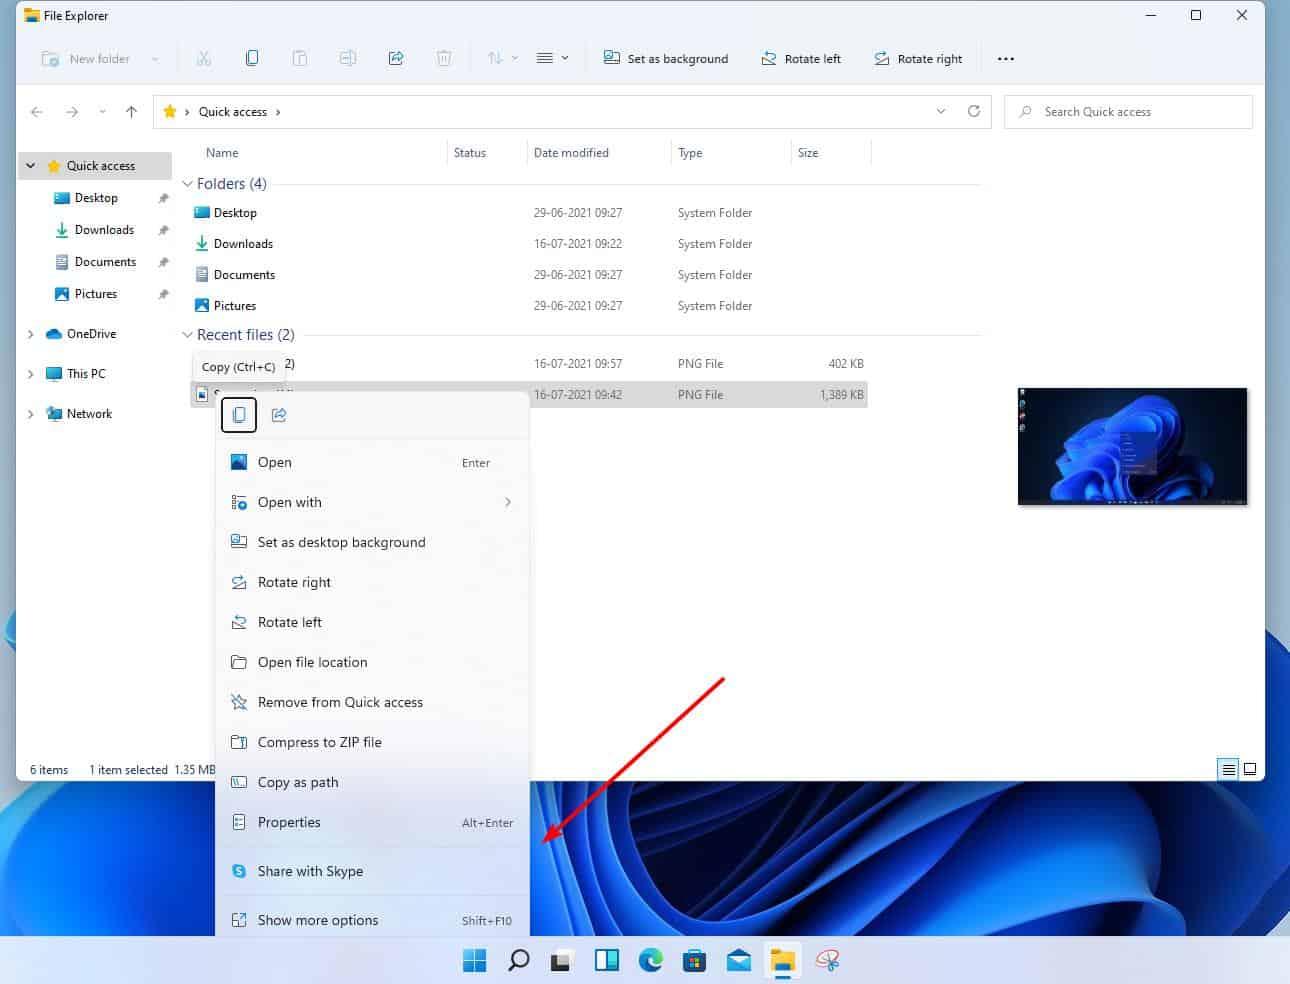 Windows 11 Insider Preview Build 22000.71 - acrylic menu in Explorer